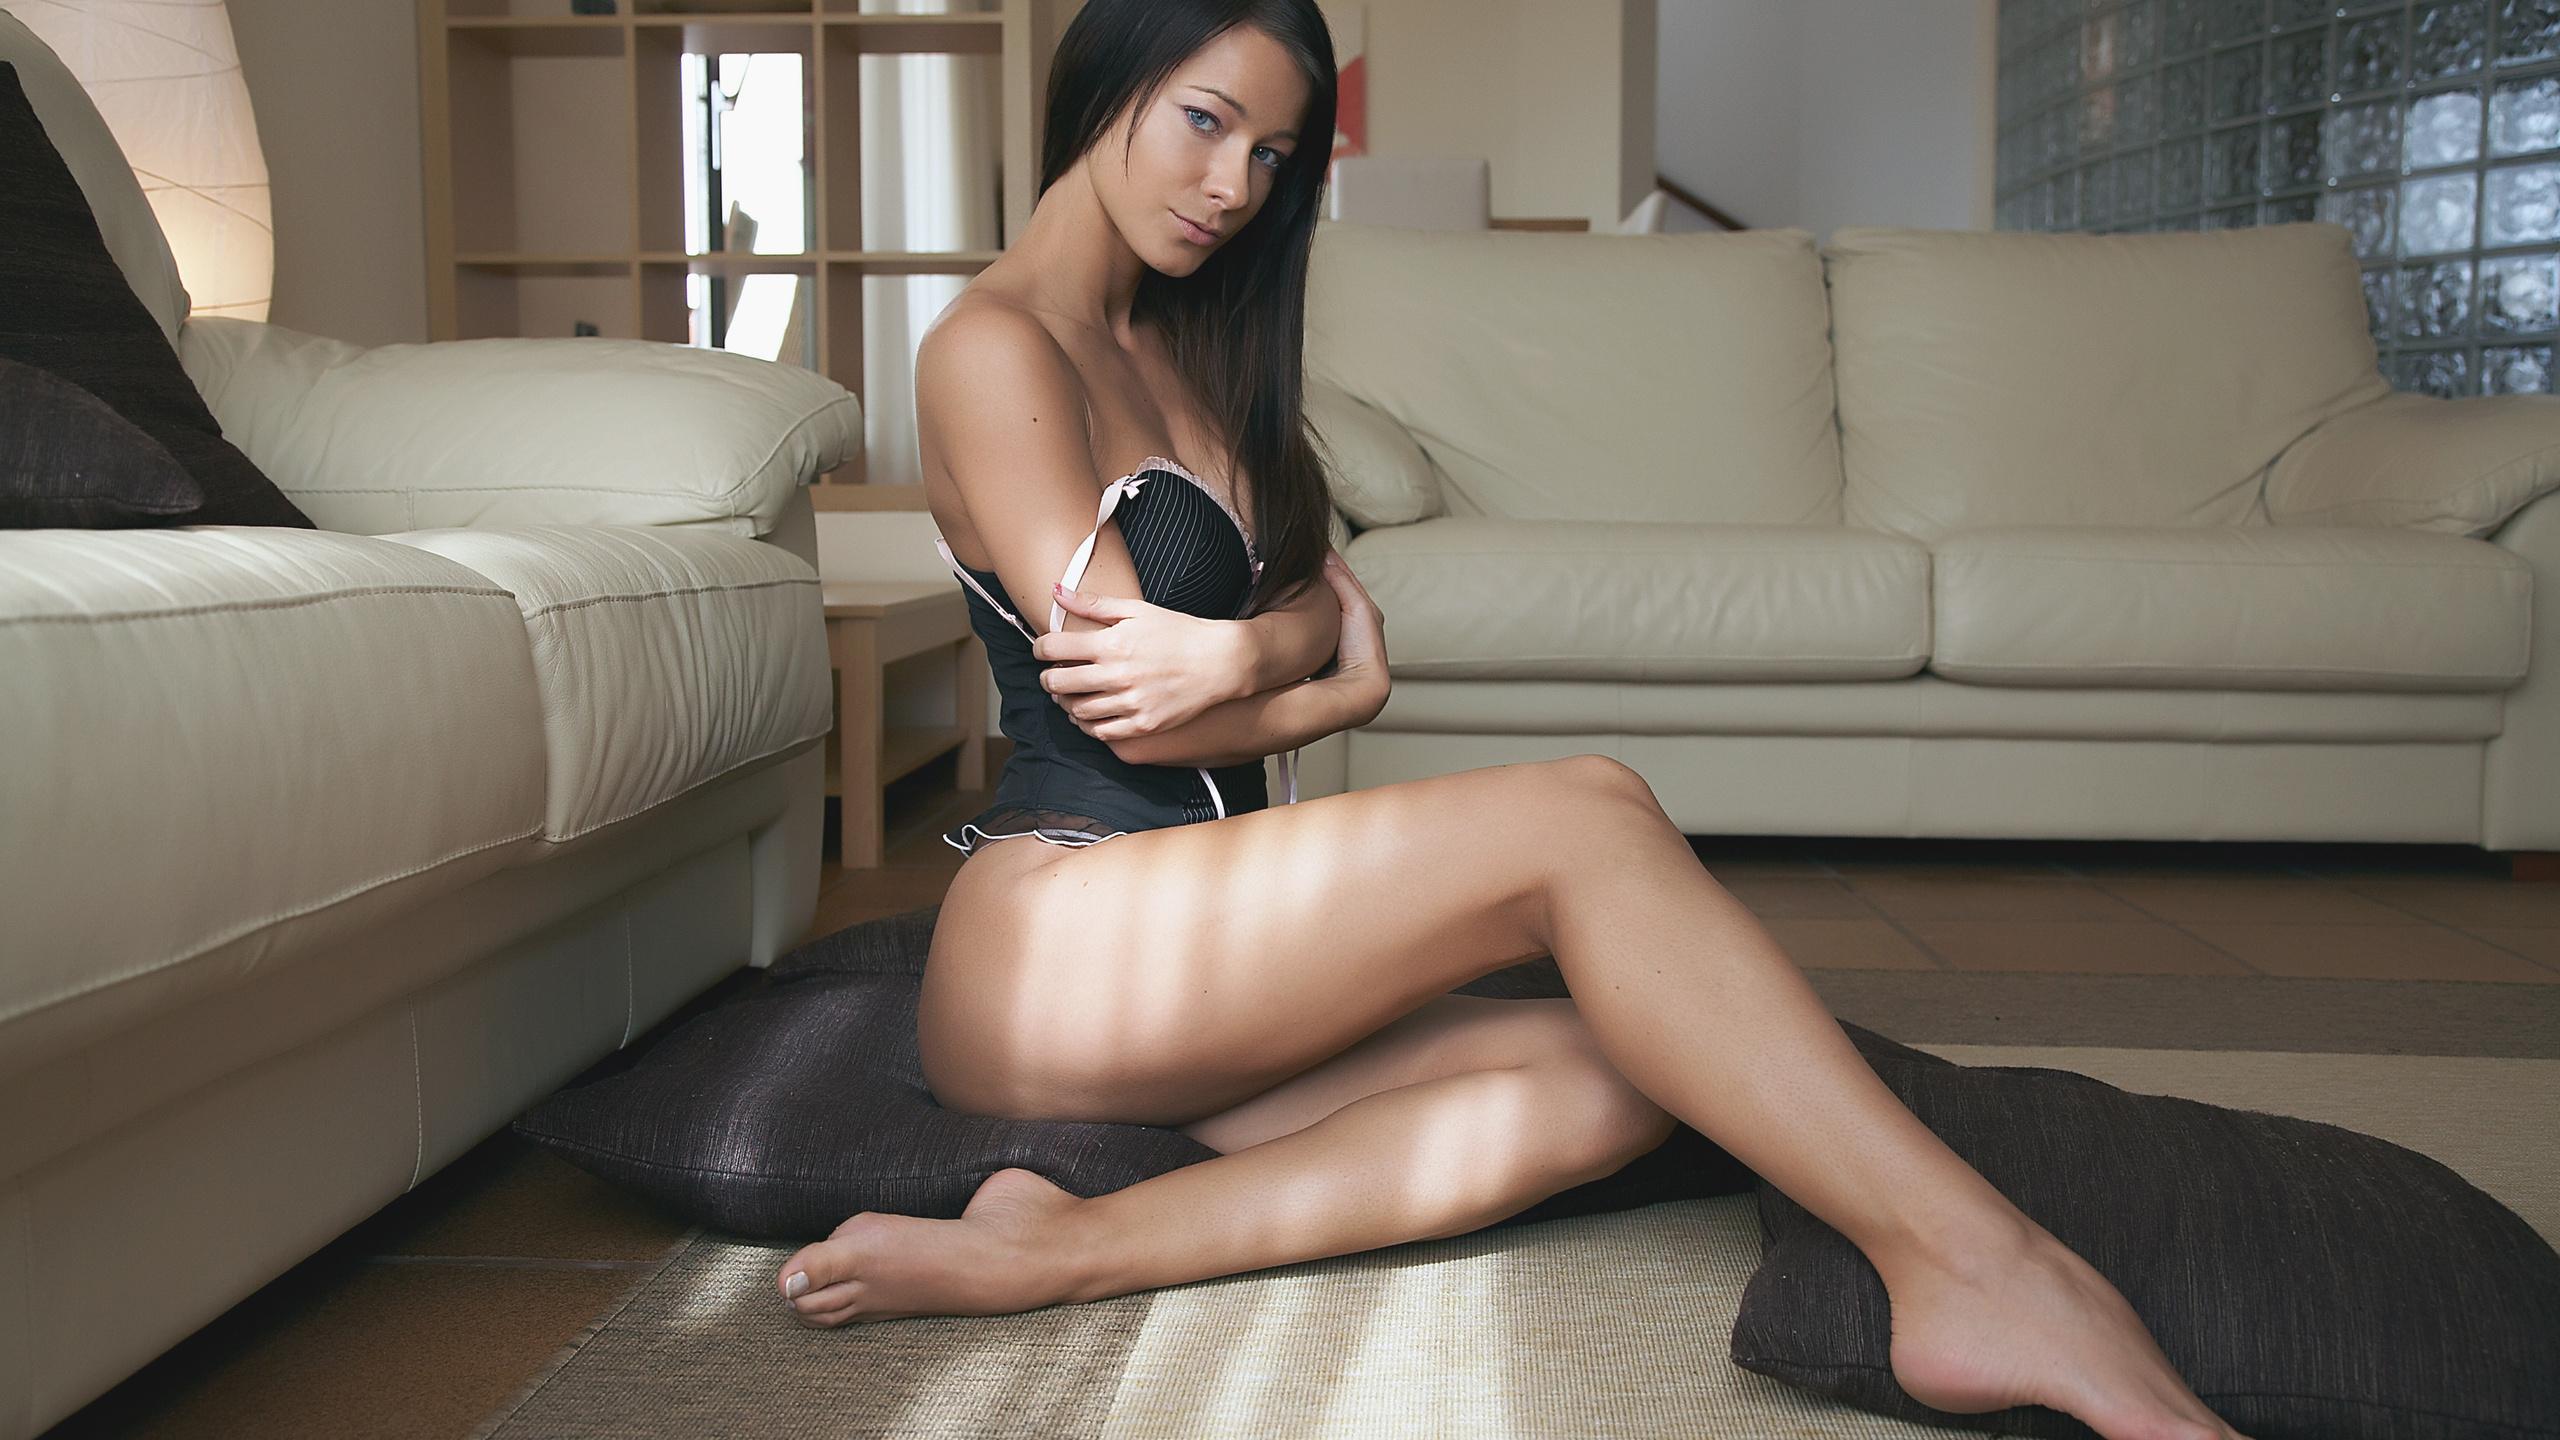 Melisa mendini маструбирует hd порно видео